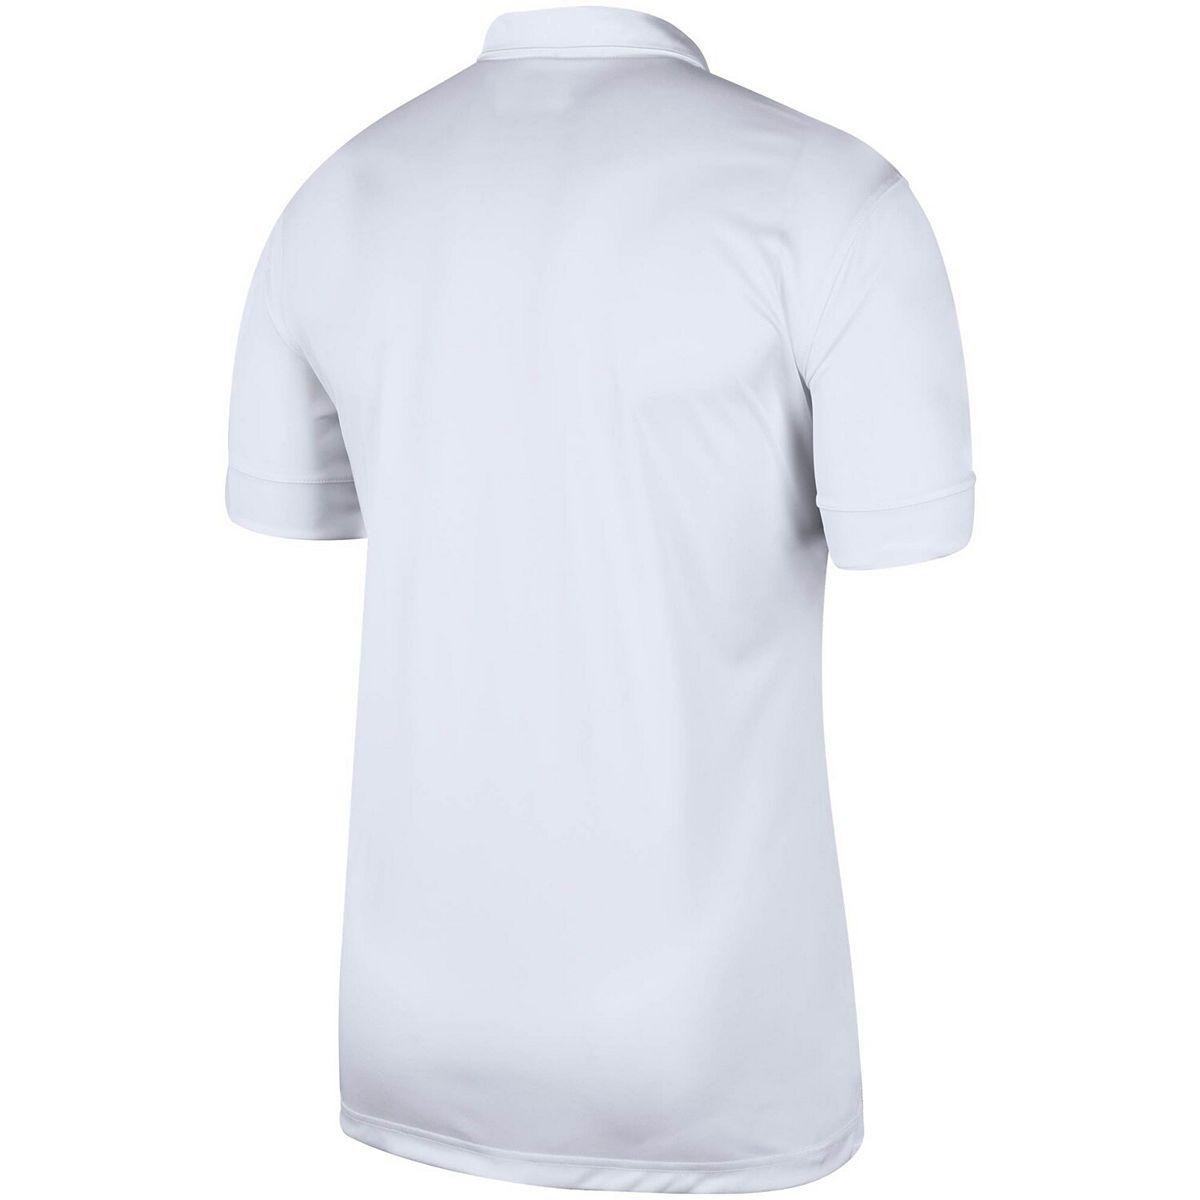 Men's Nike White/Black Arkansas Razorbacks Striped Polo igpYF